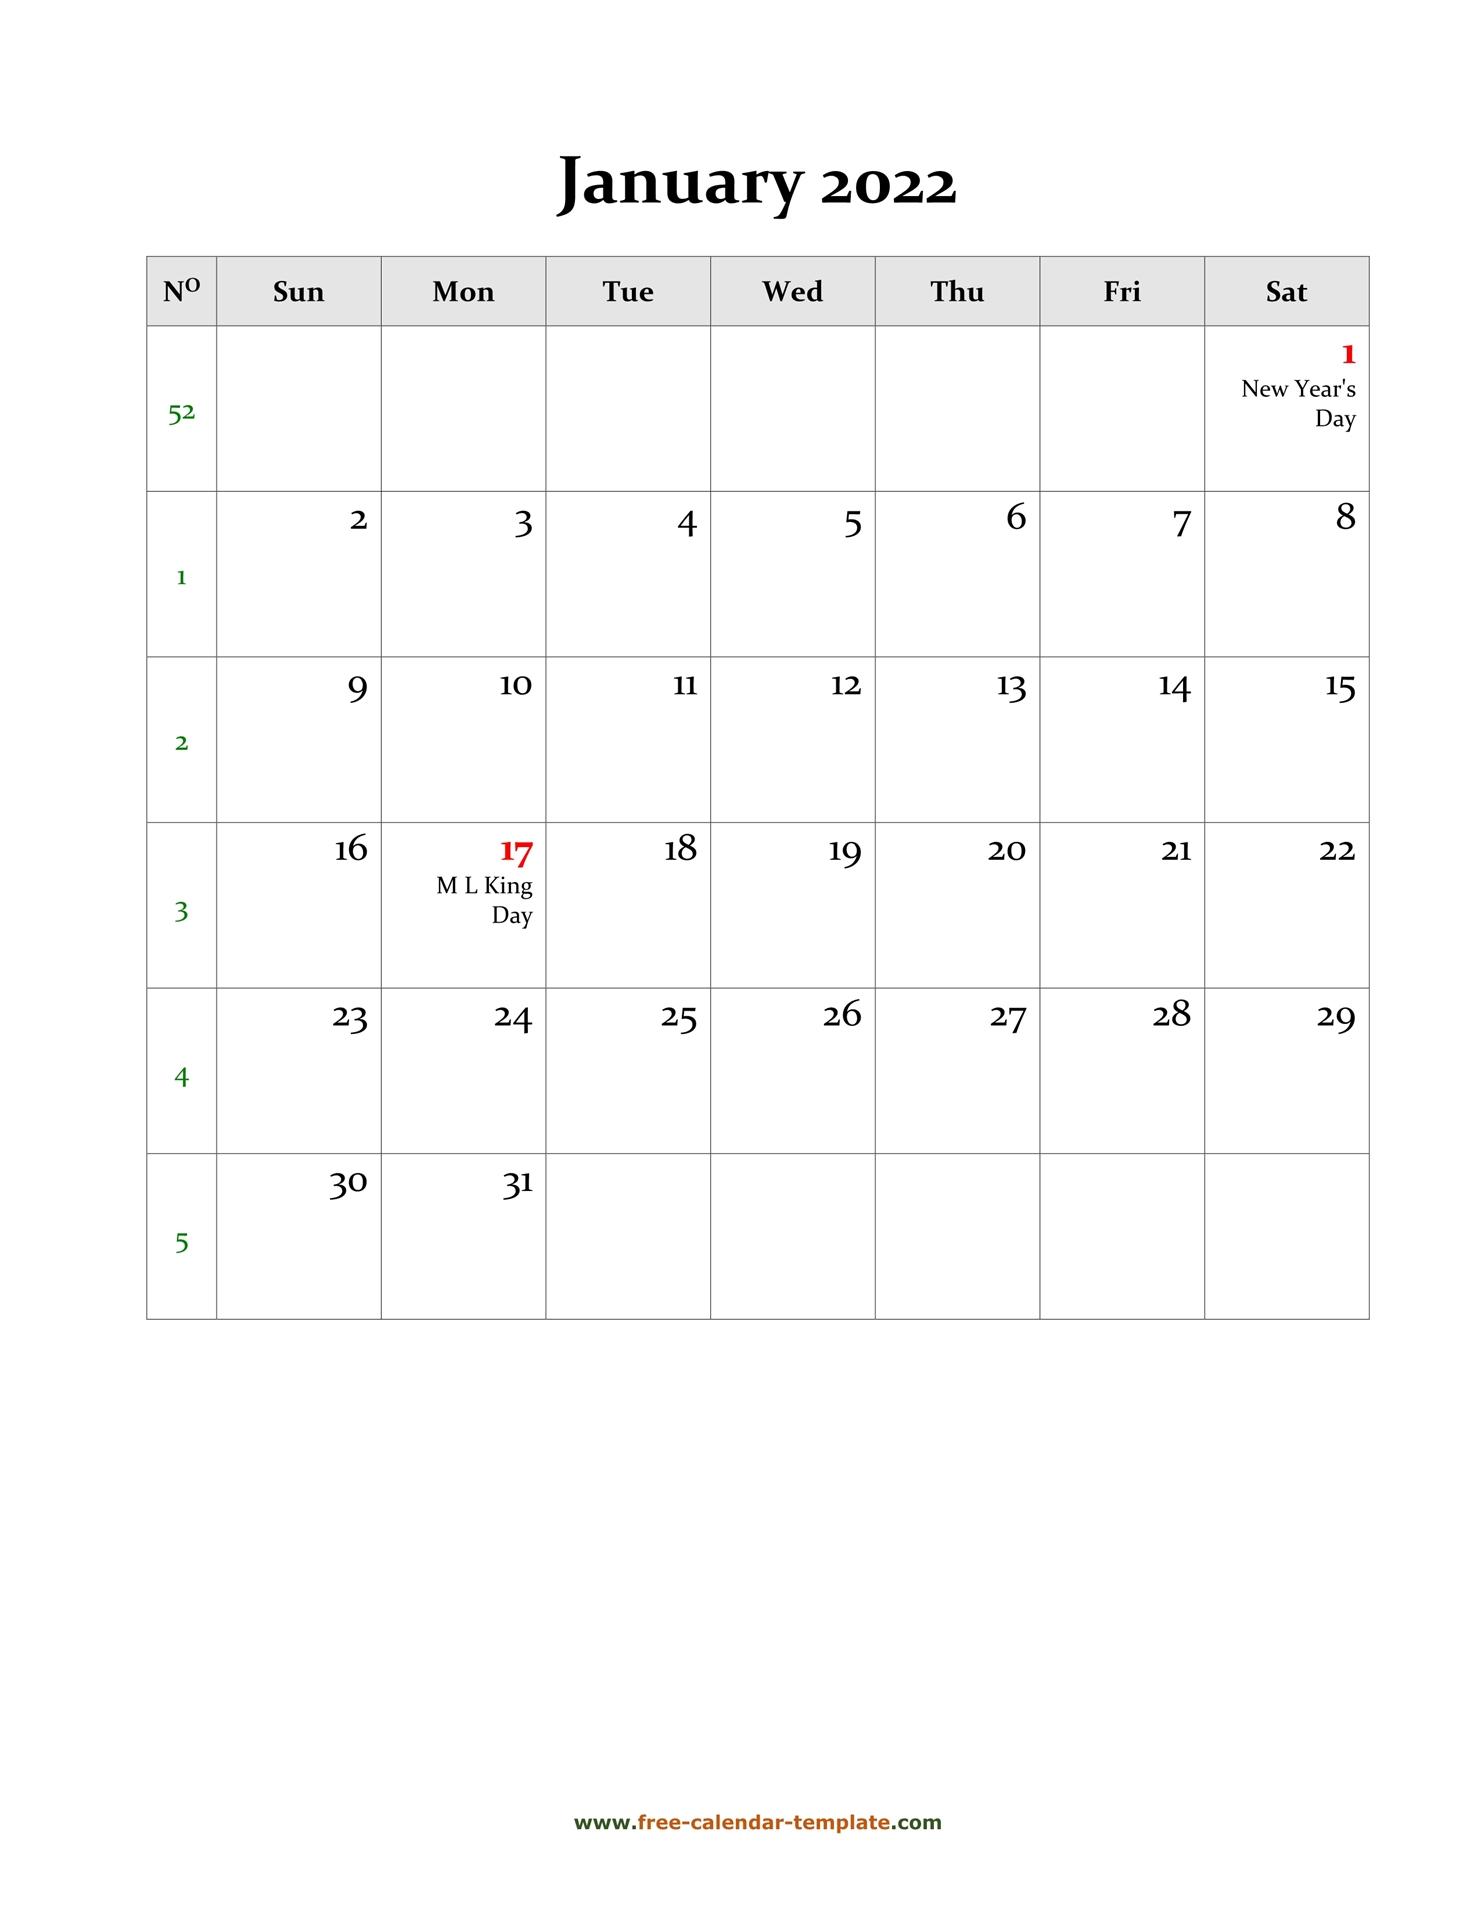 2022 January Calendar (Blank Vertical Template) | Free In January 2022 Calendar Template